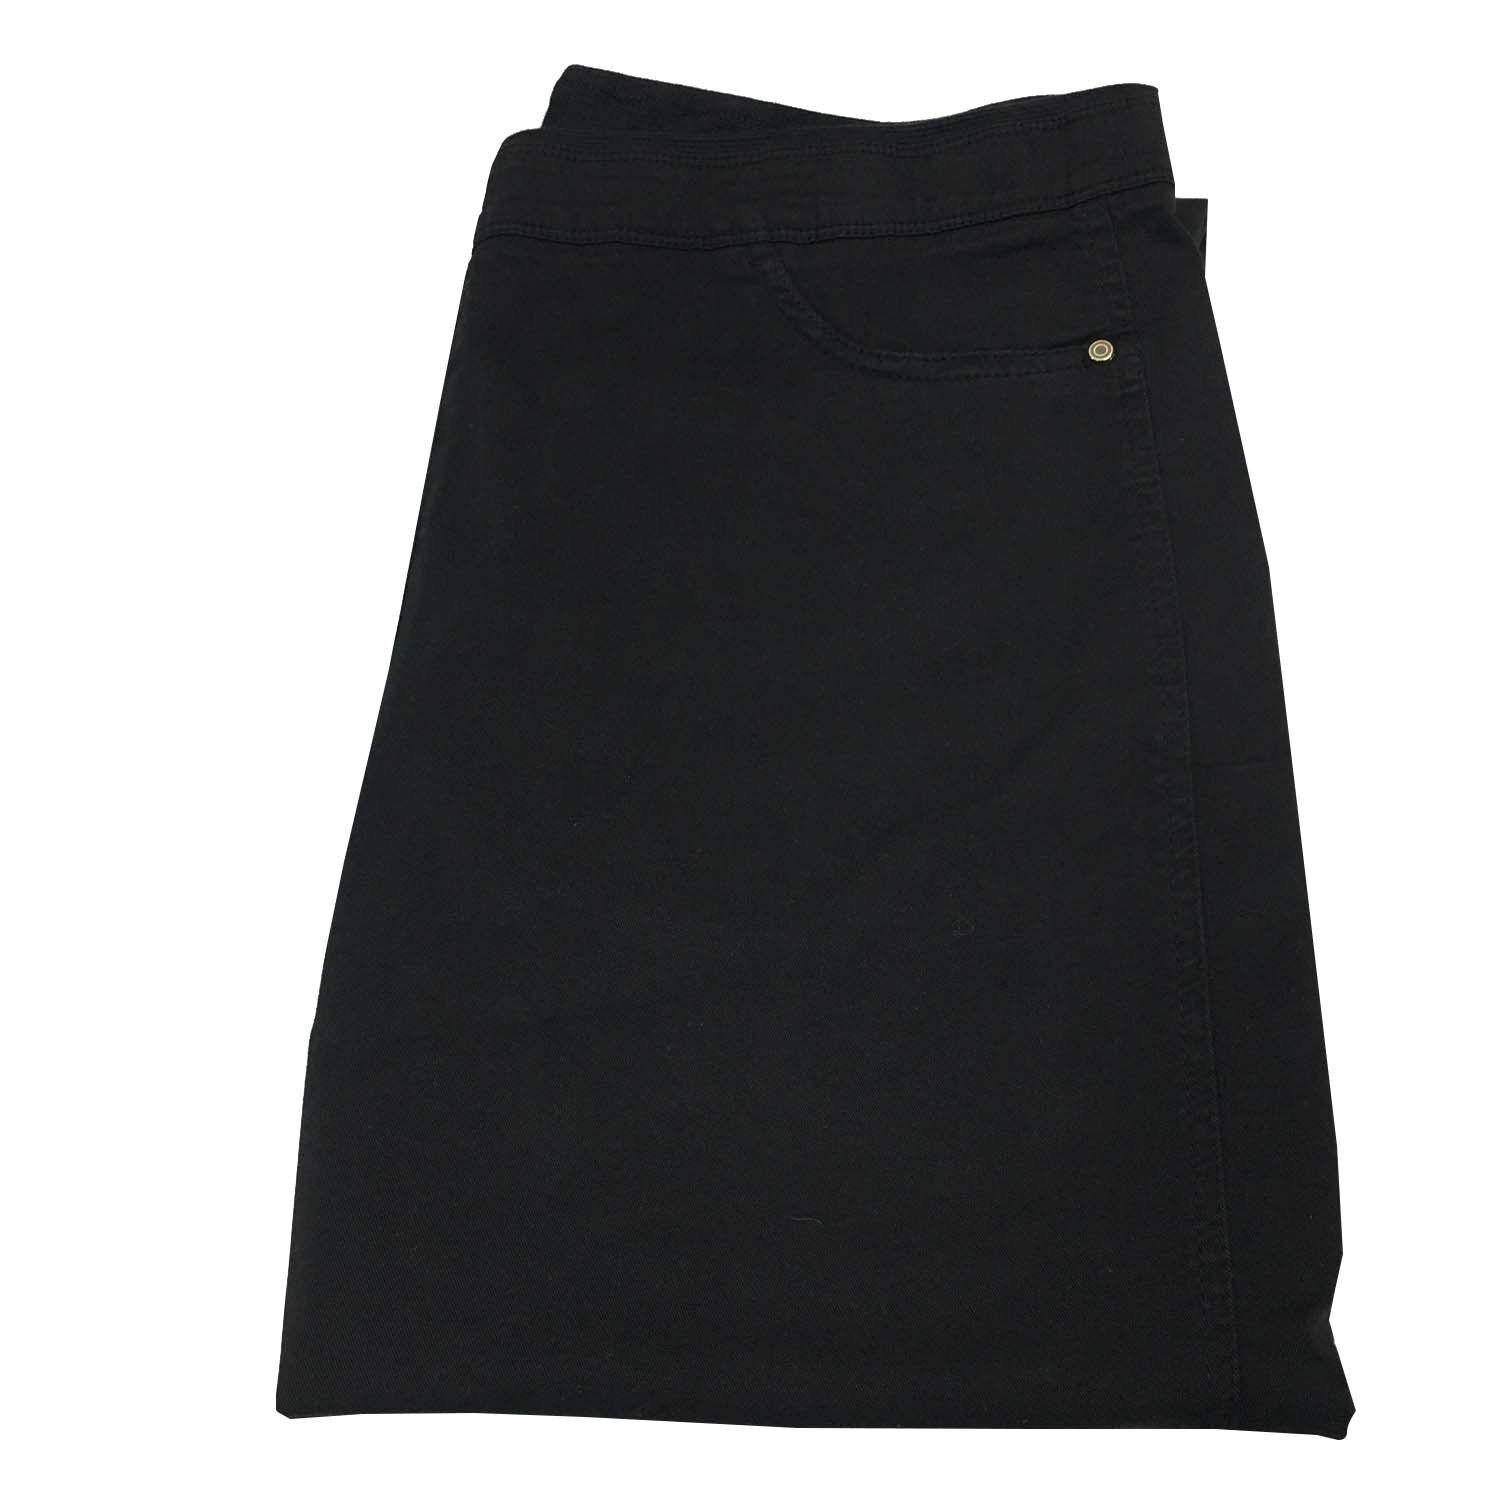 ELENA Mirò Damenhose schwarz elastisch im Leben 97% Baumwolle 3% Elasthan